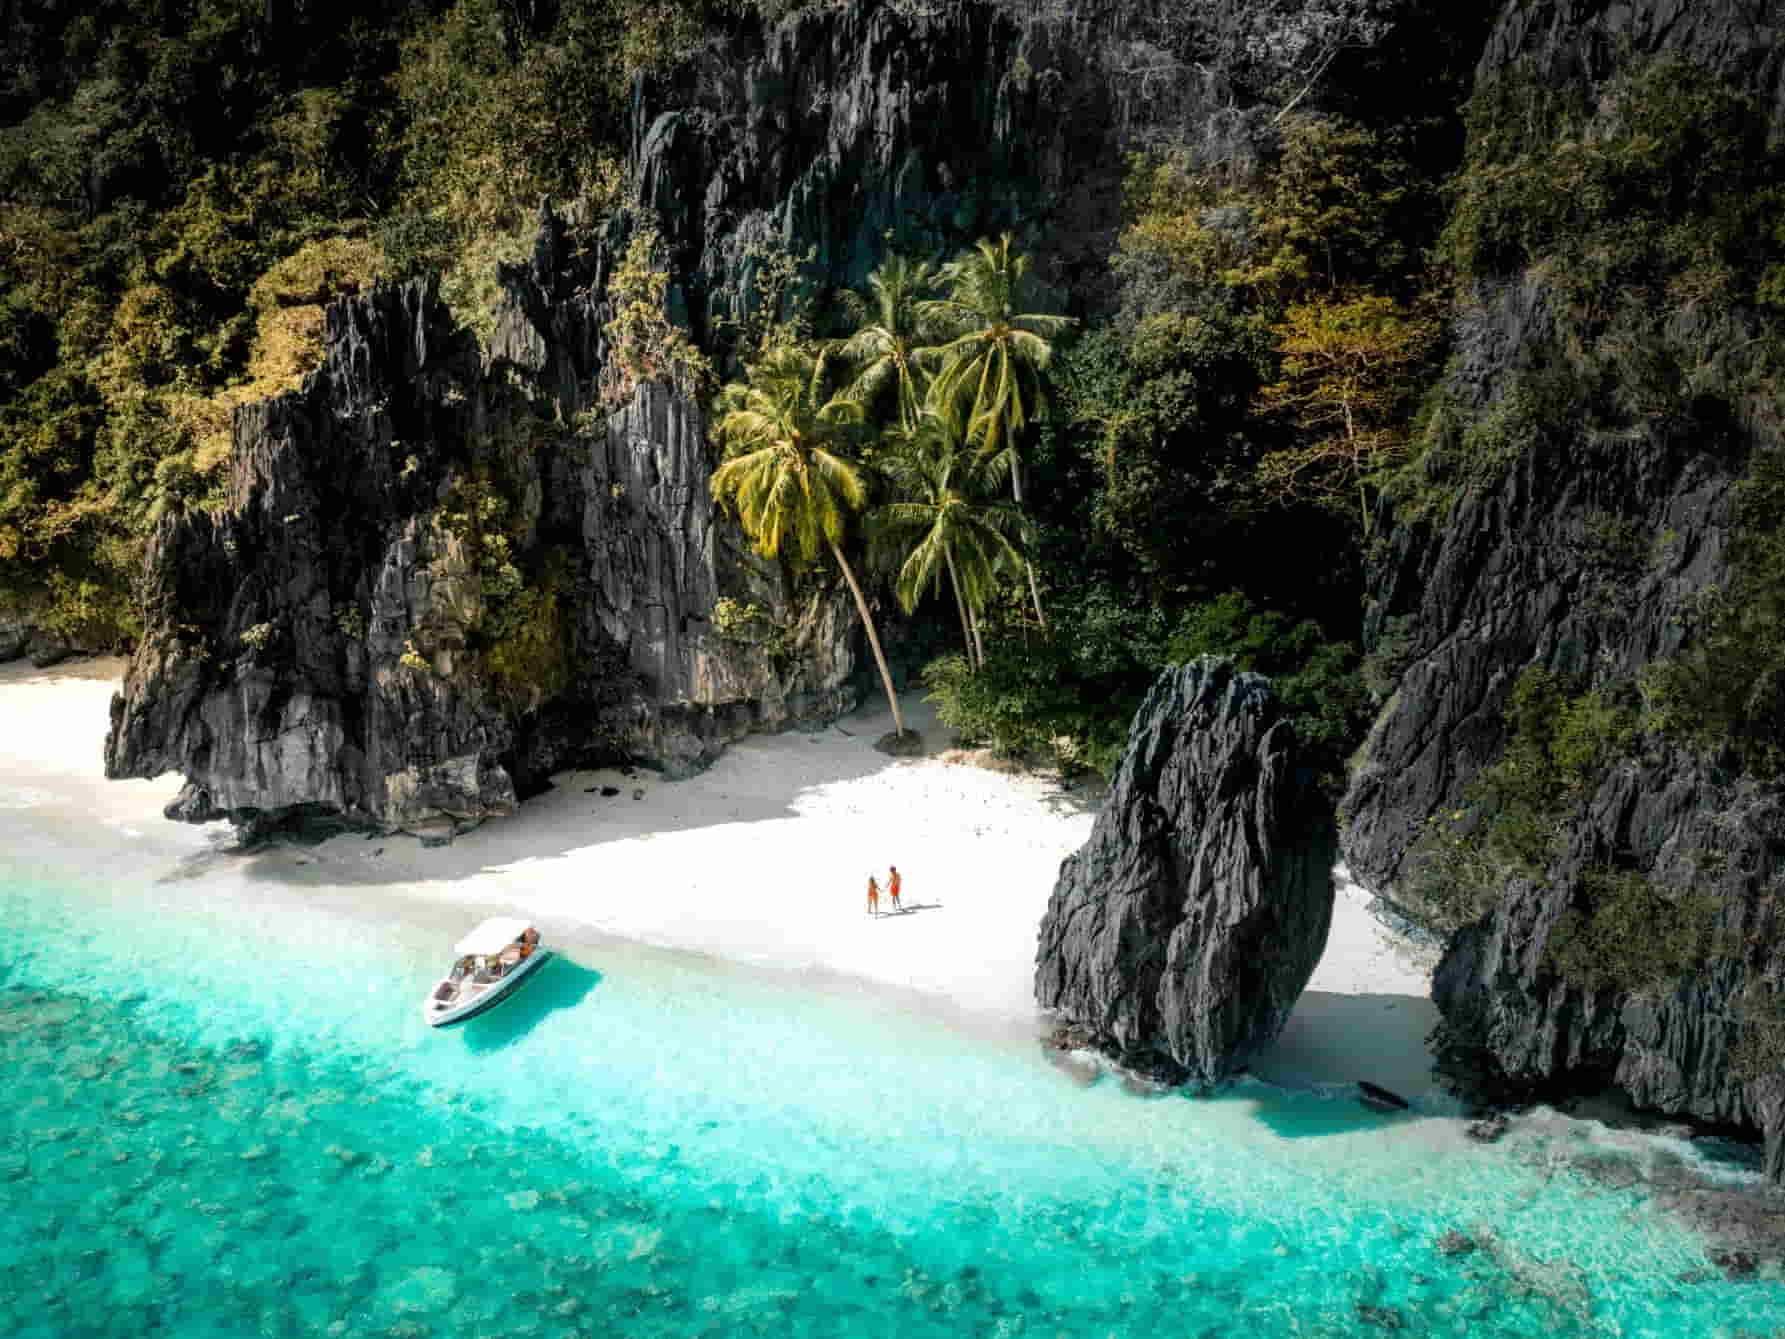 Phlippines Beaches